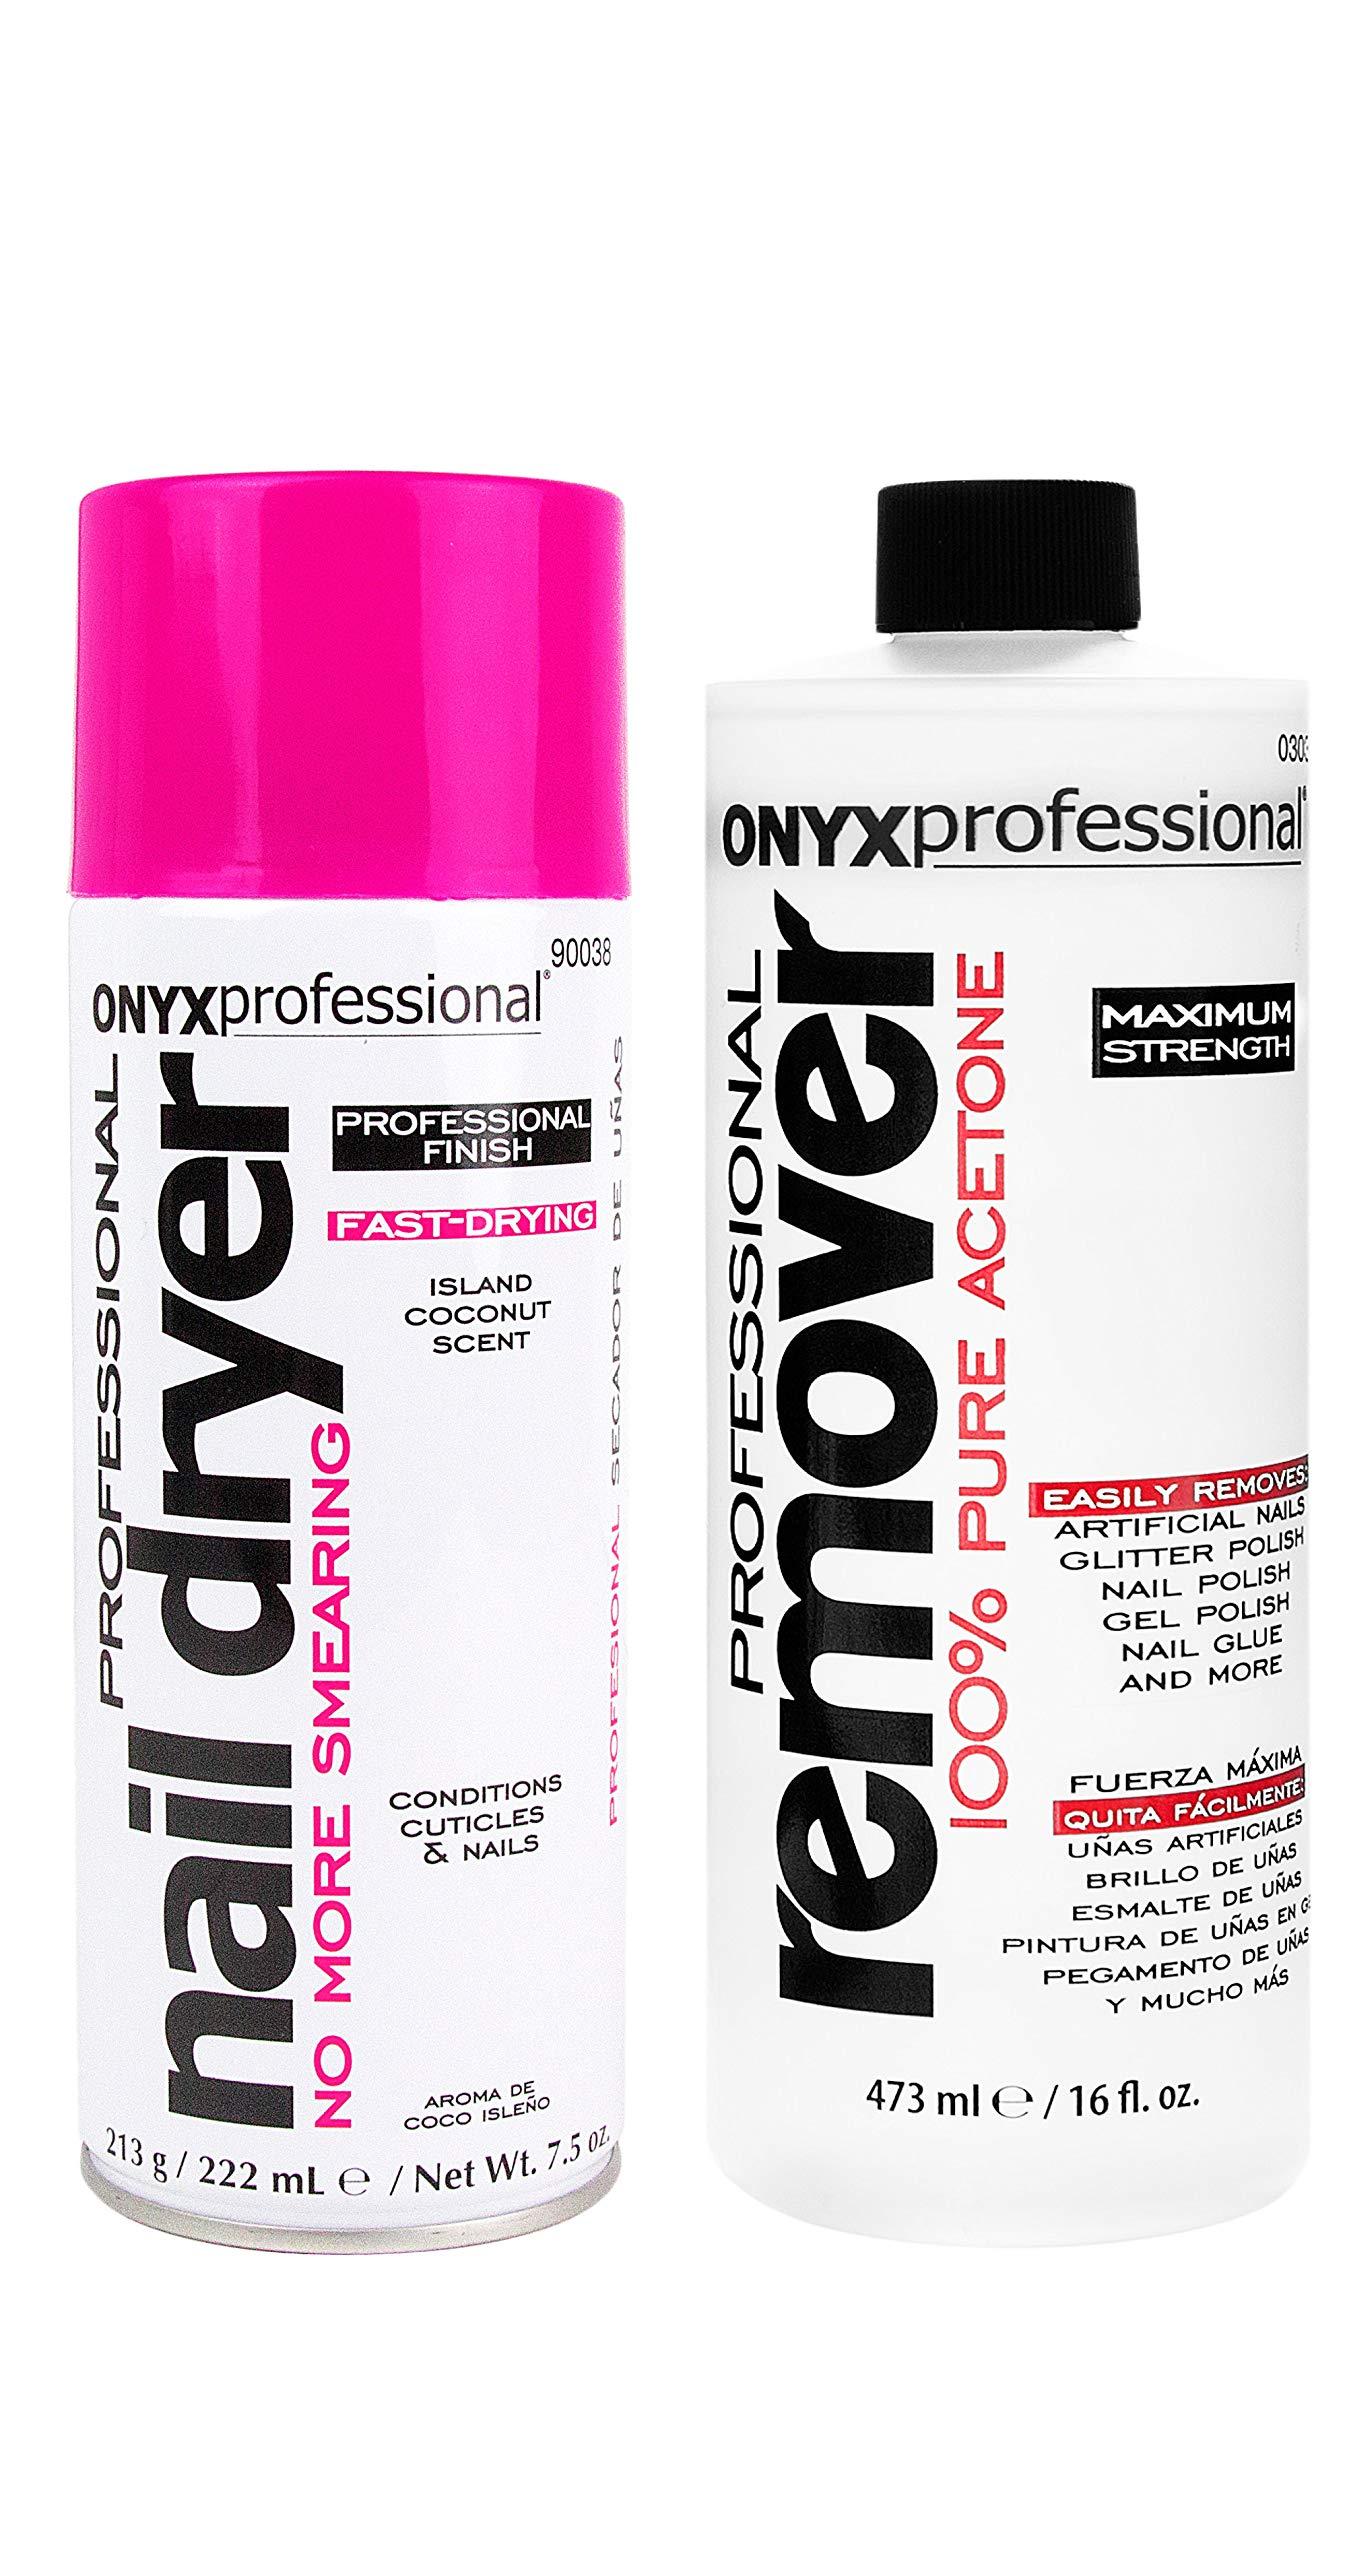 Onyx Professional 100% Acetone Nail Polish Remover 16oz & Nail Dryer 7.5oz, by Onyx Professional